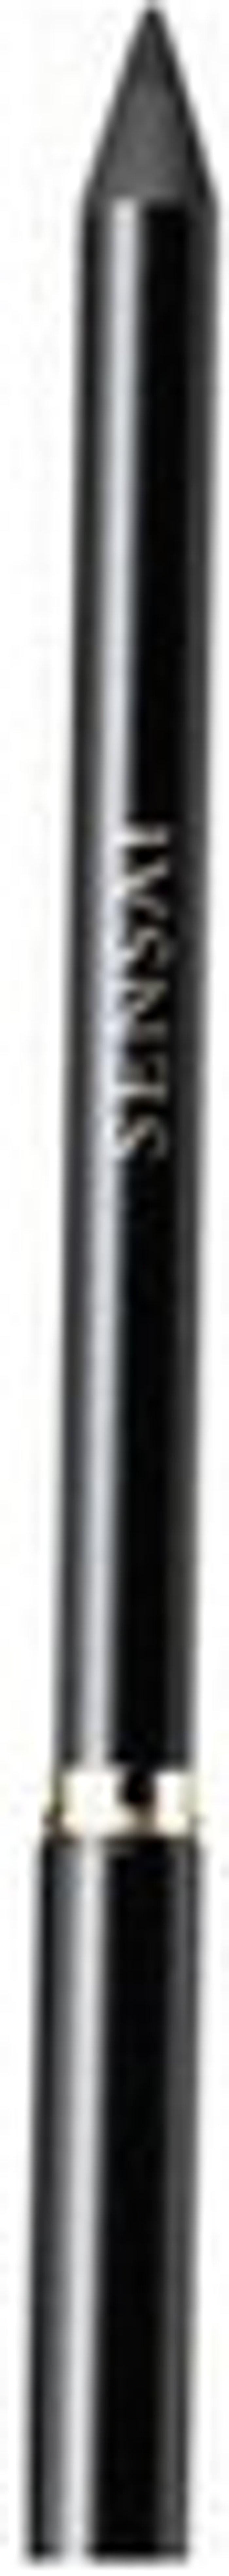 Kanebo Kanebo Sensai Colours Eyeliner Pencil (1,3 g)